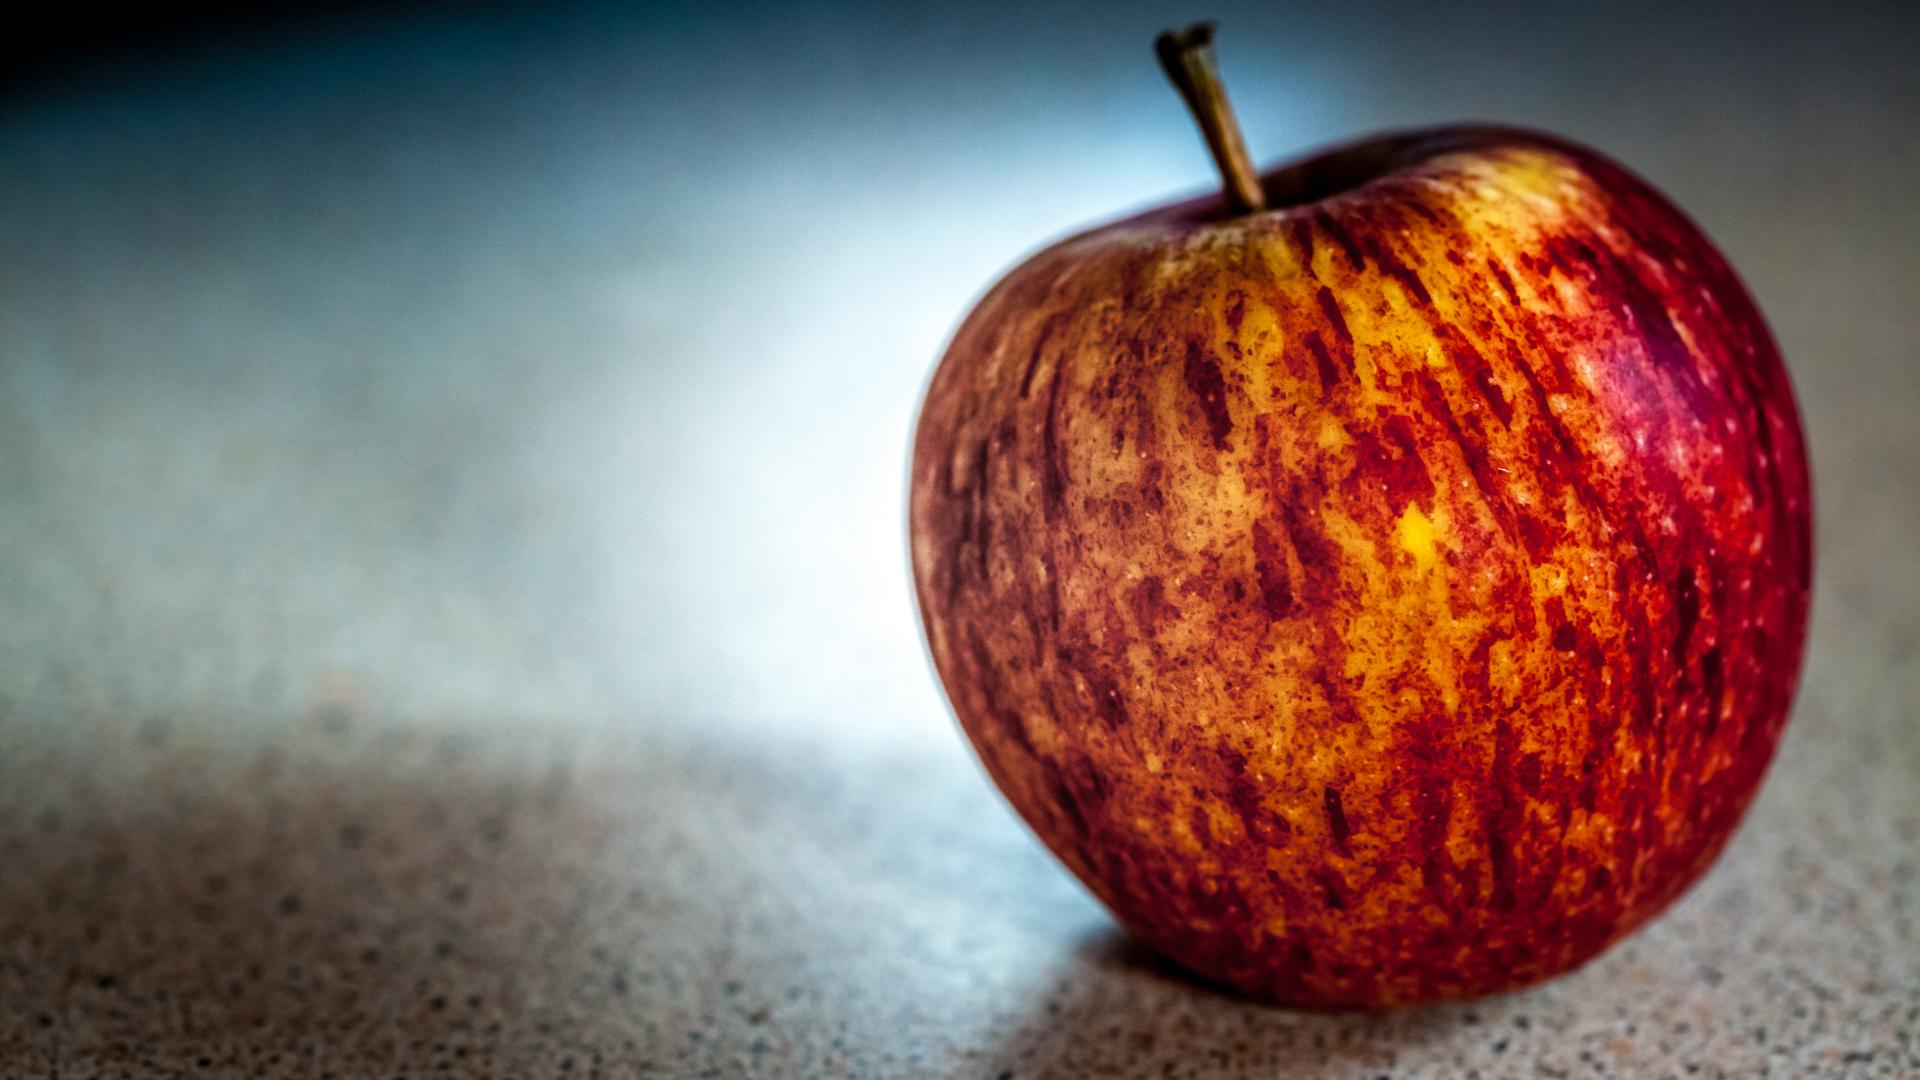 timelapse apple